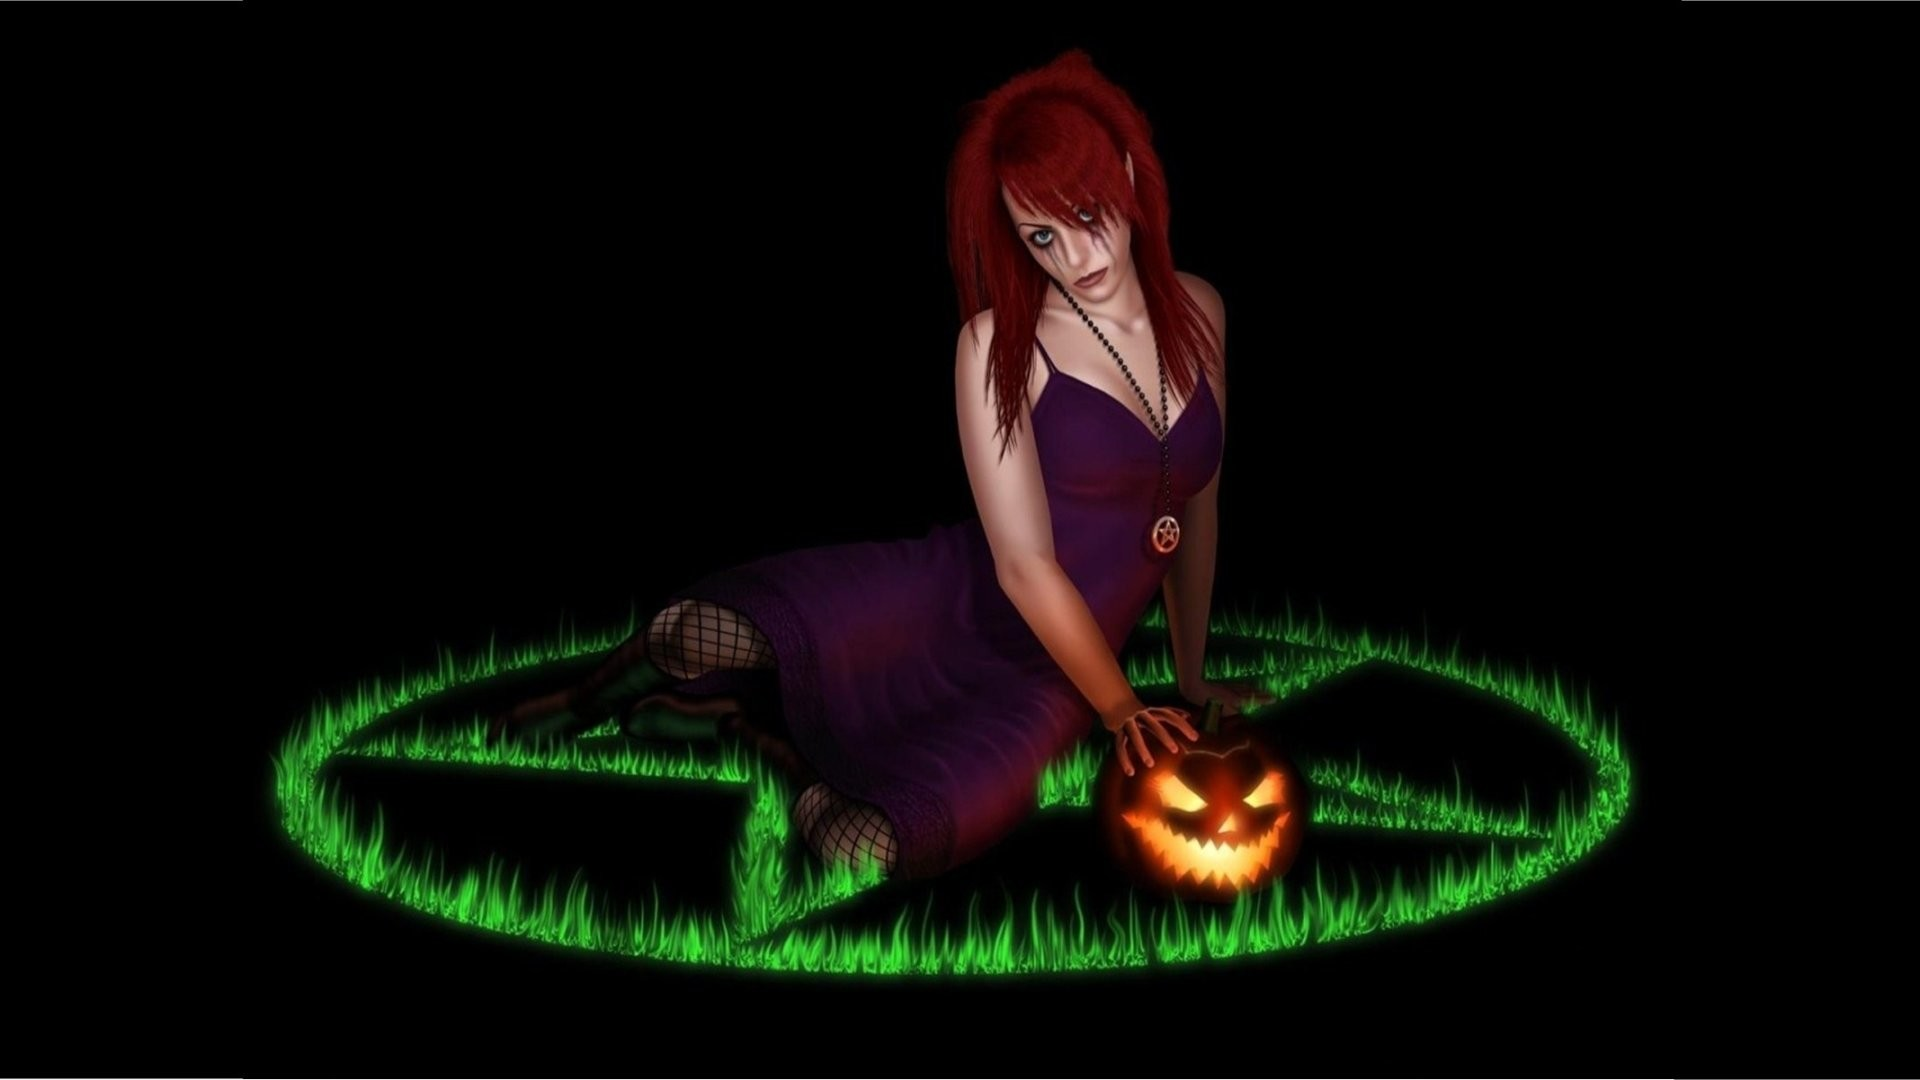 Fantasy – Witch Beautiful Gothic Jack-o'-lantern Pentagram Fantasy Wallpaper